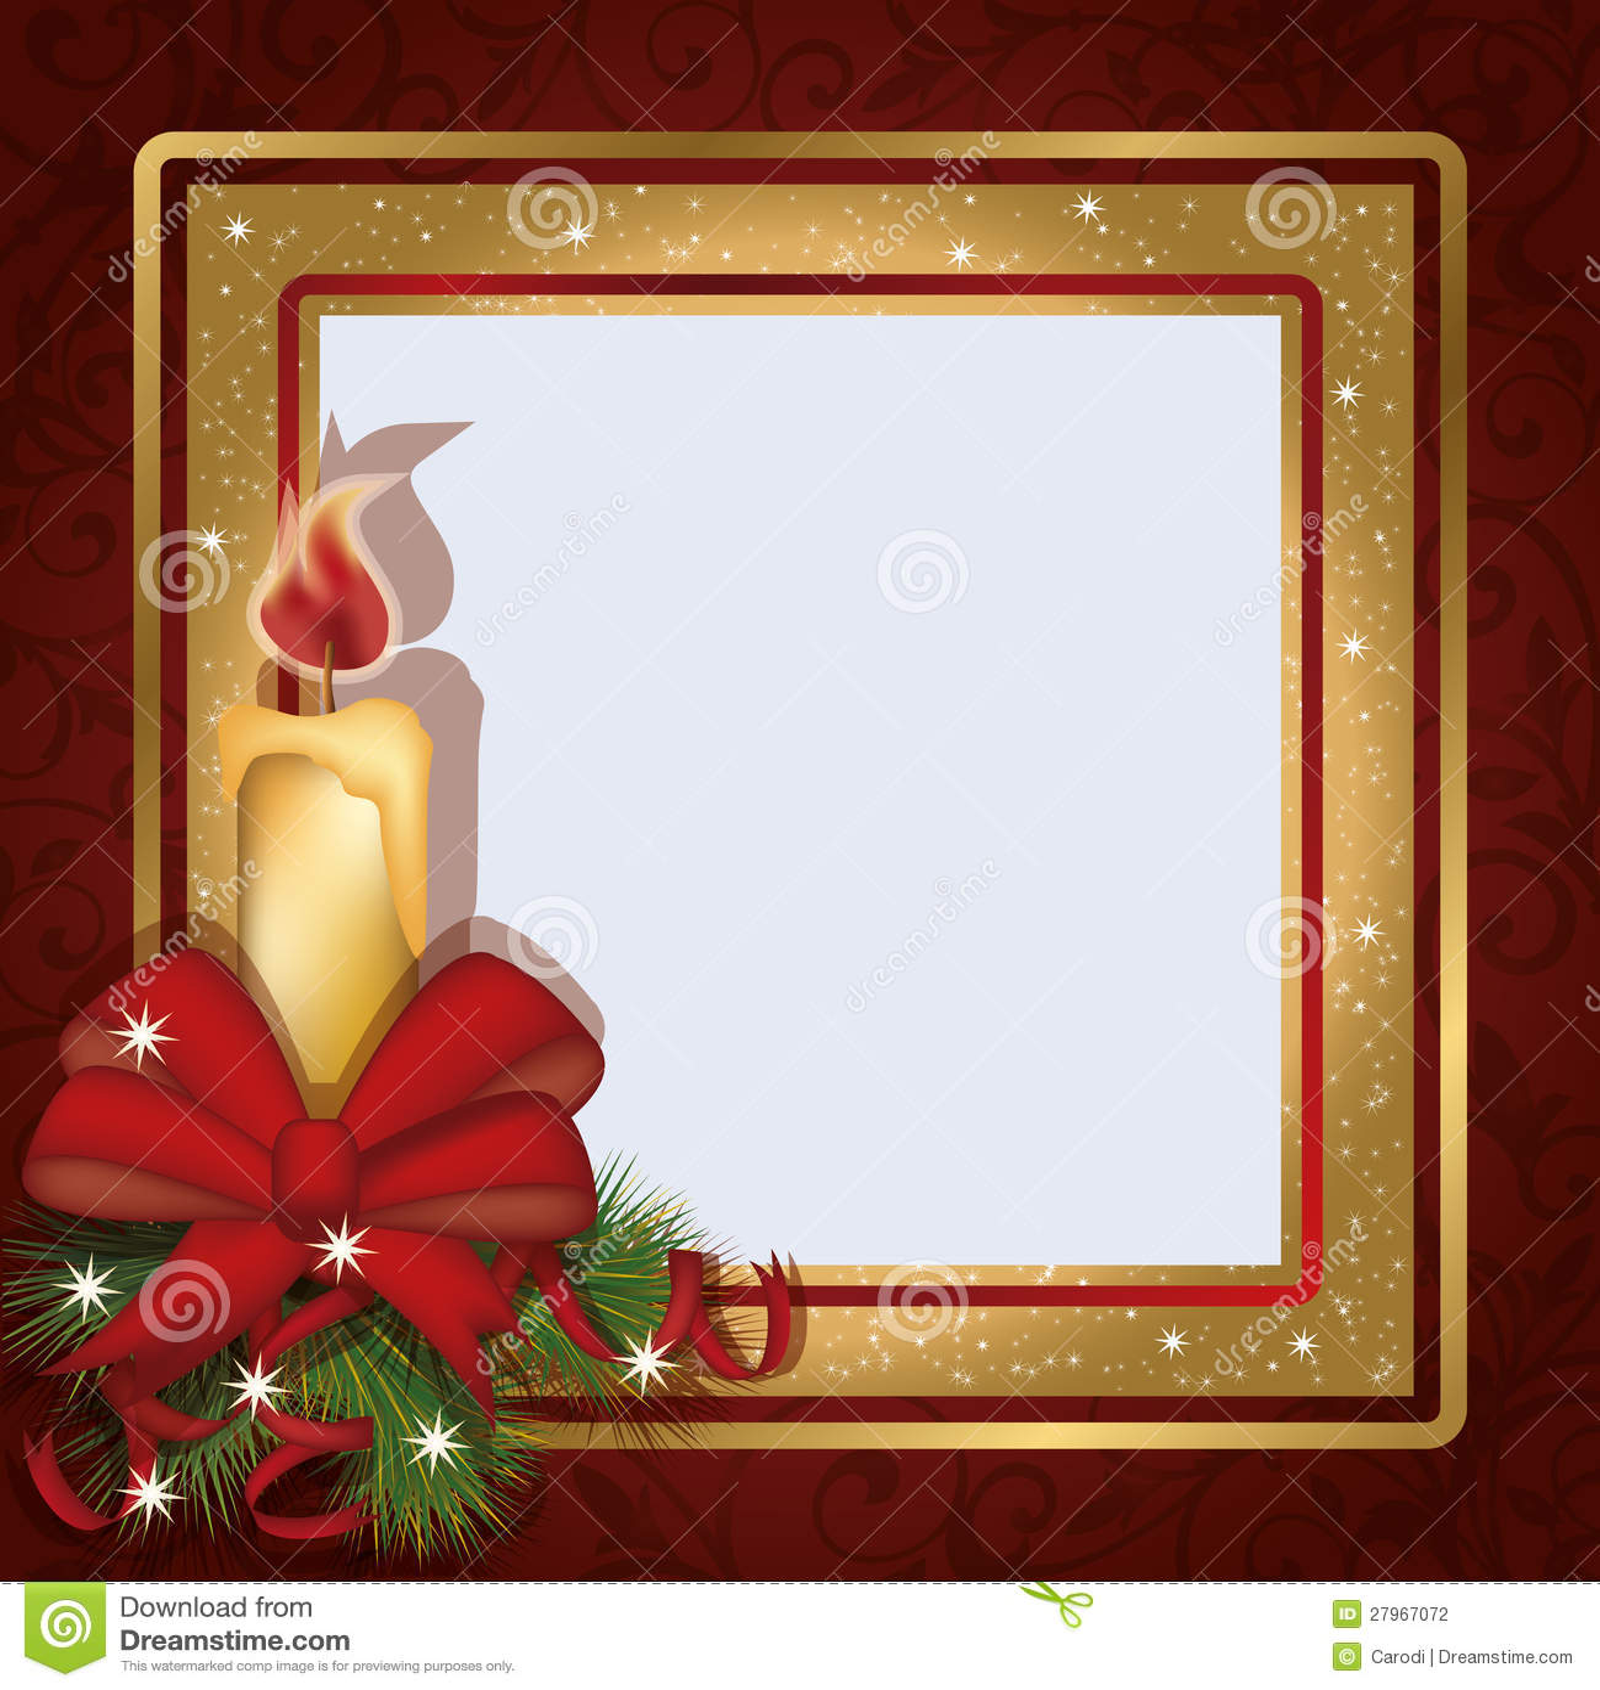 Christmas invitation photo frame scrapbooking